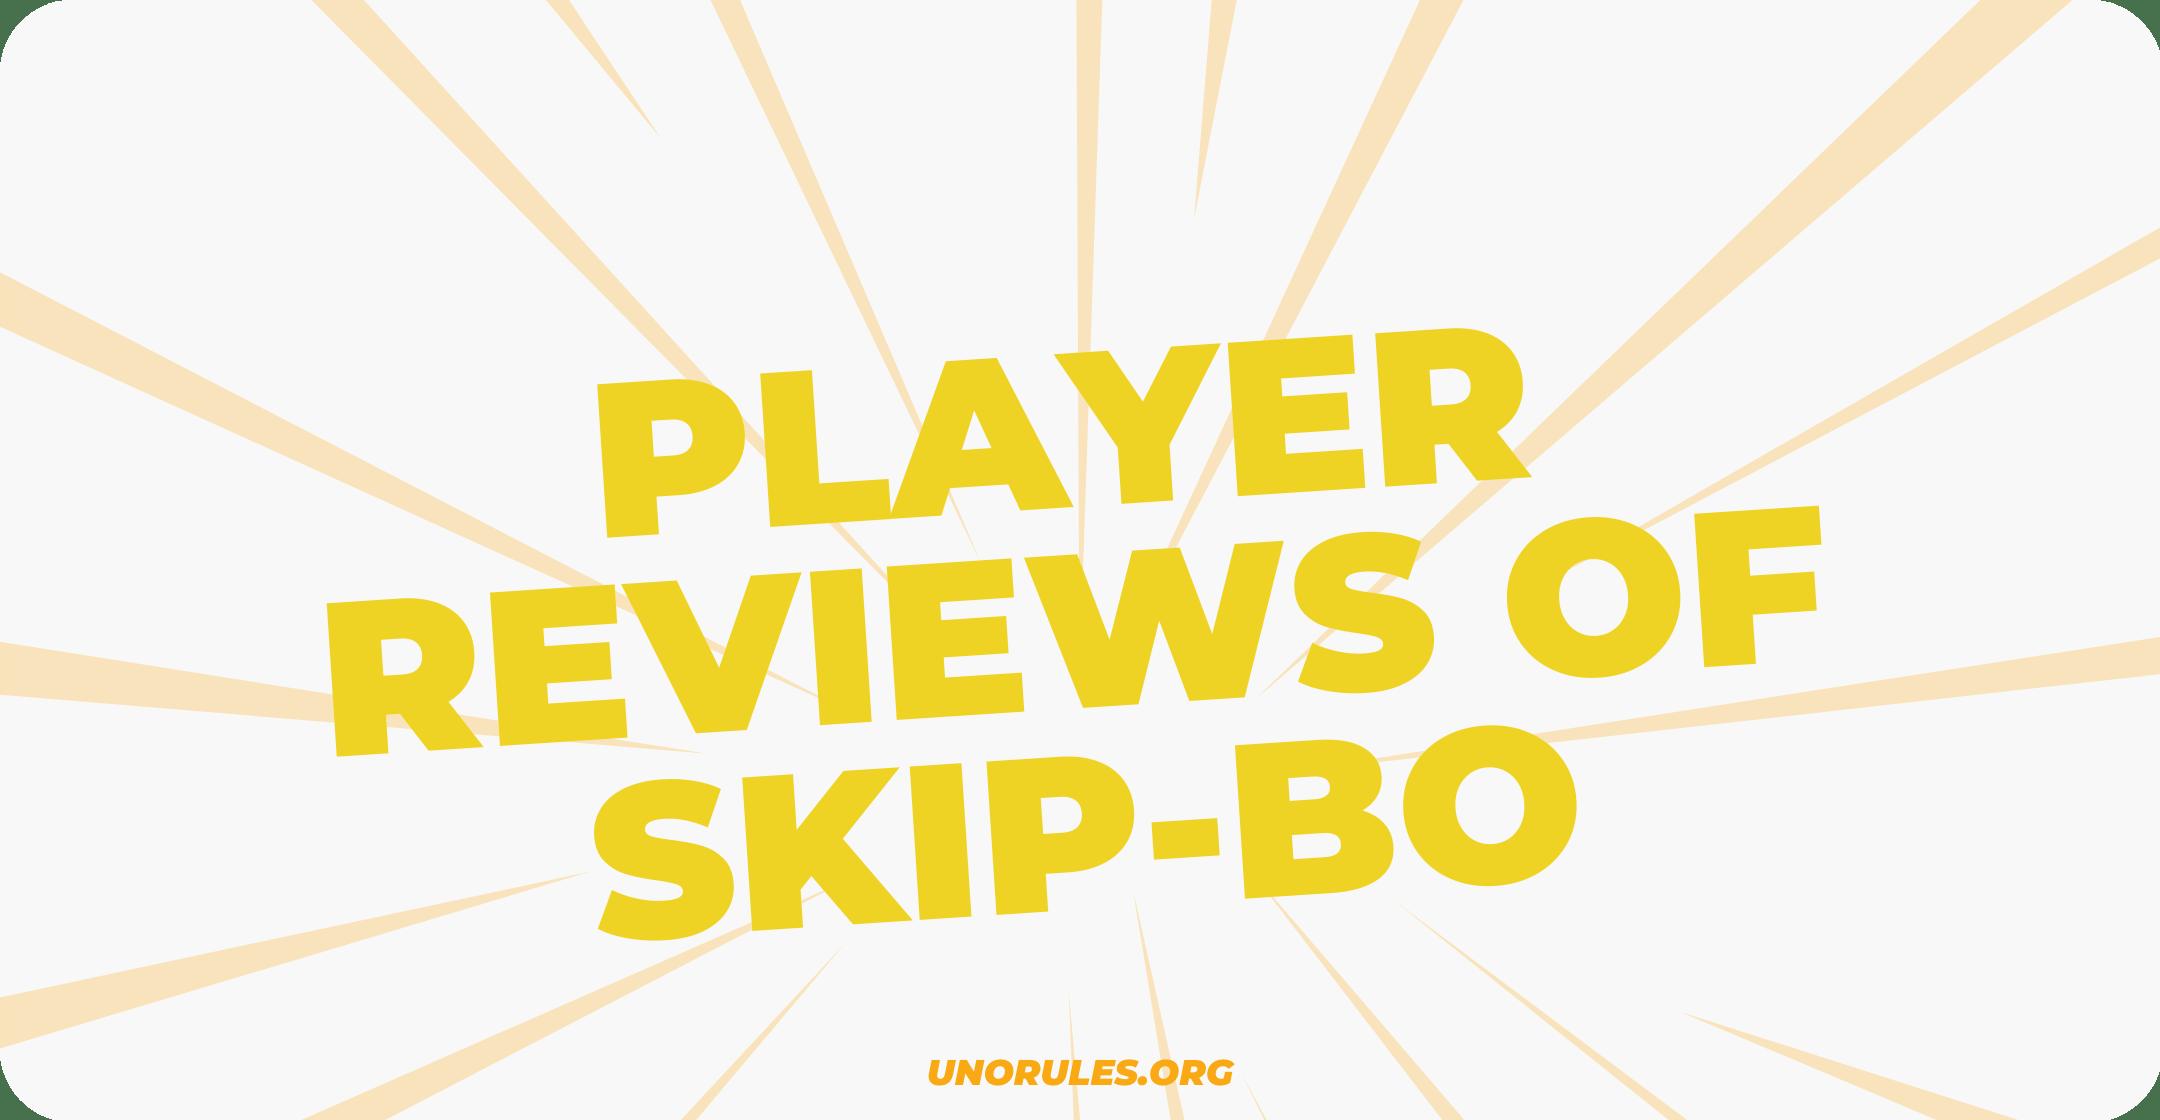 Player reviews of Skip-Bo